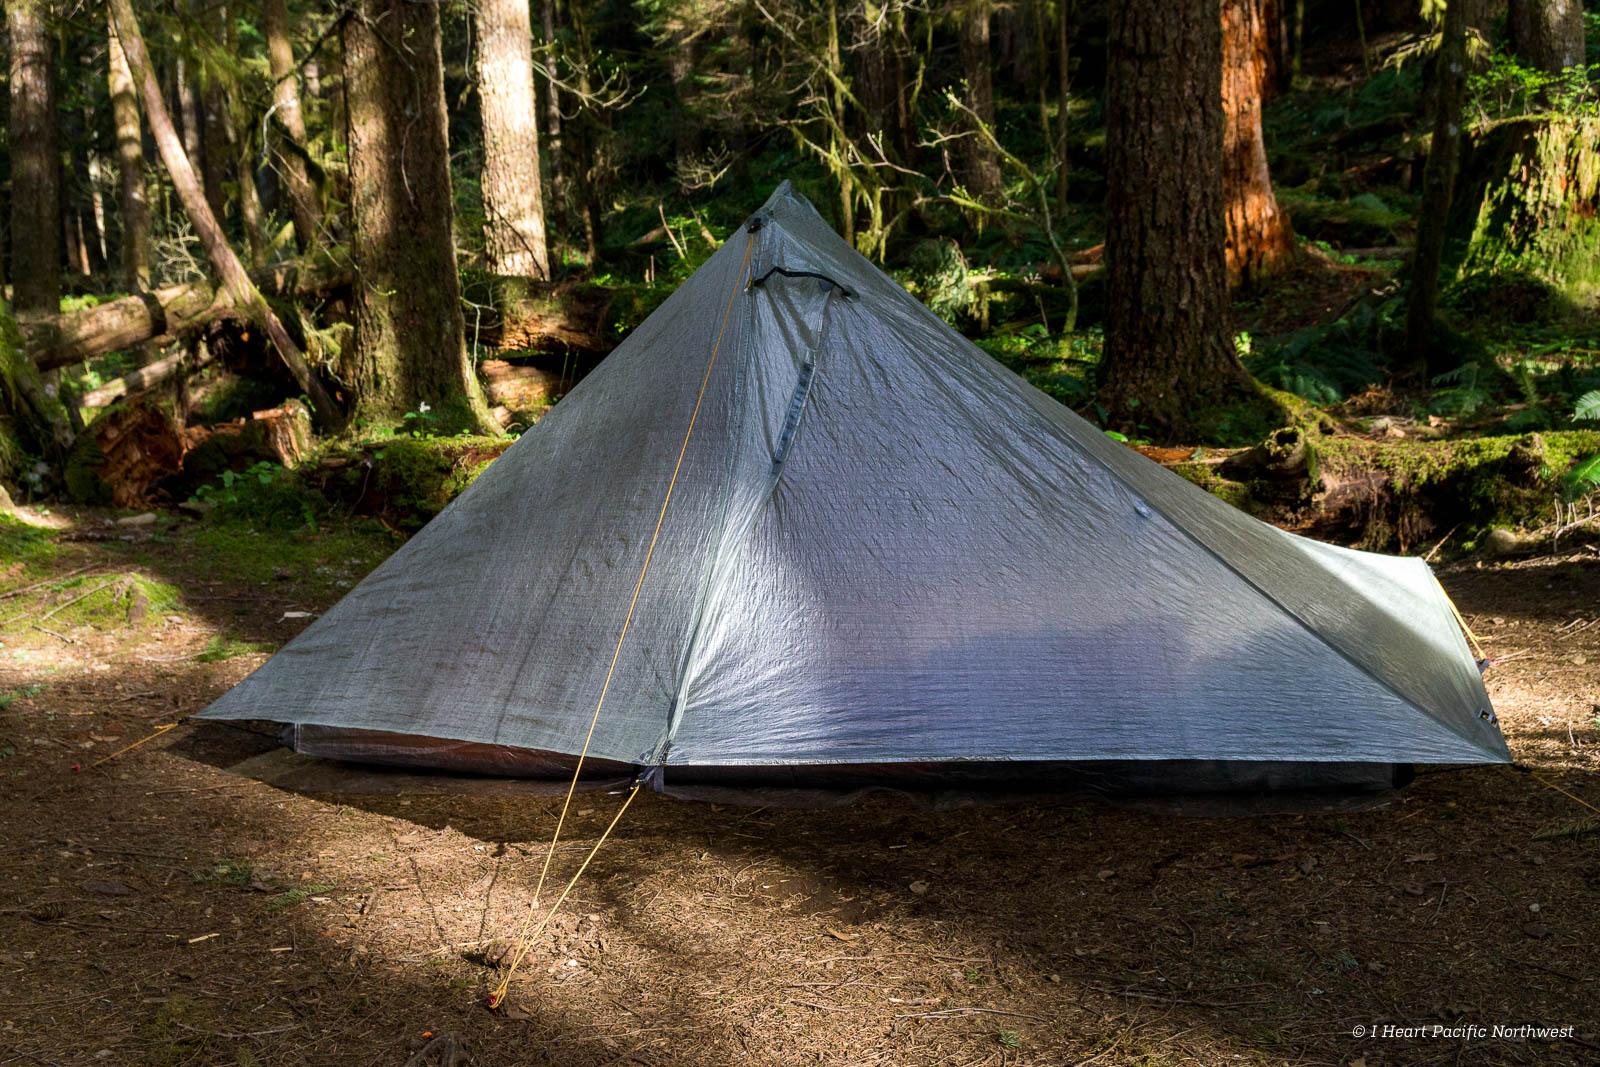 gear review: Tarptent Aeon Li ultralight tent